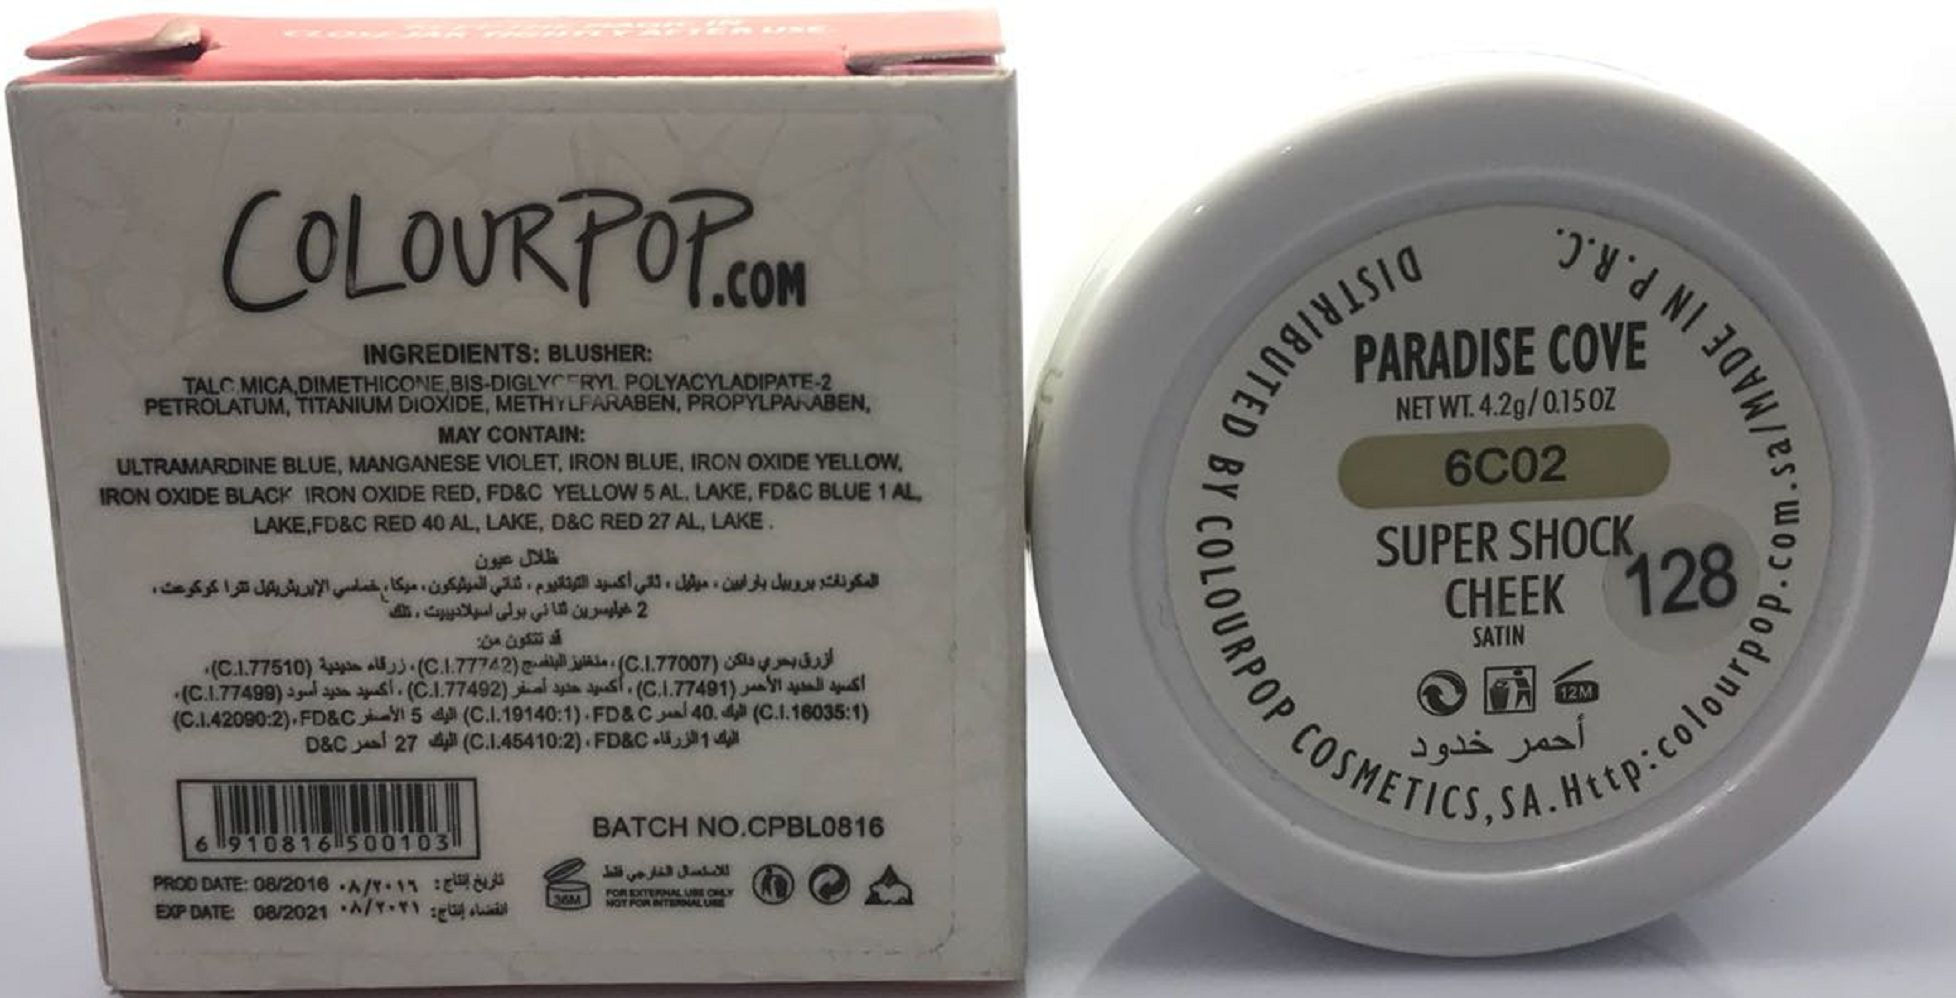 fa8da64130d COM Pressed Powder Blush Light Brown With Mild Shine PARADISE COVE 4.2 gm  ...